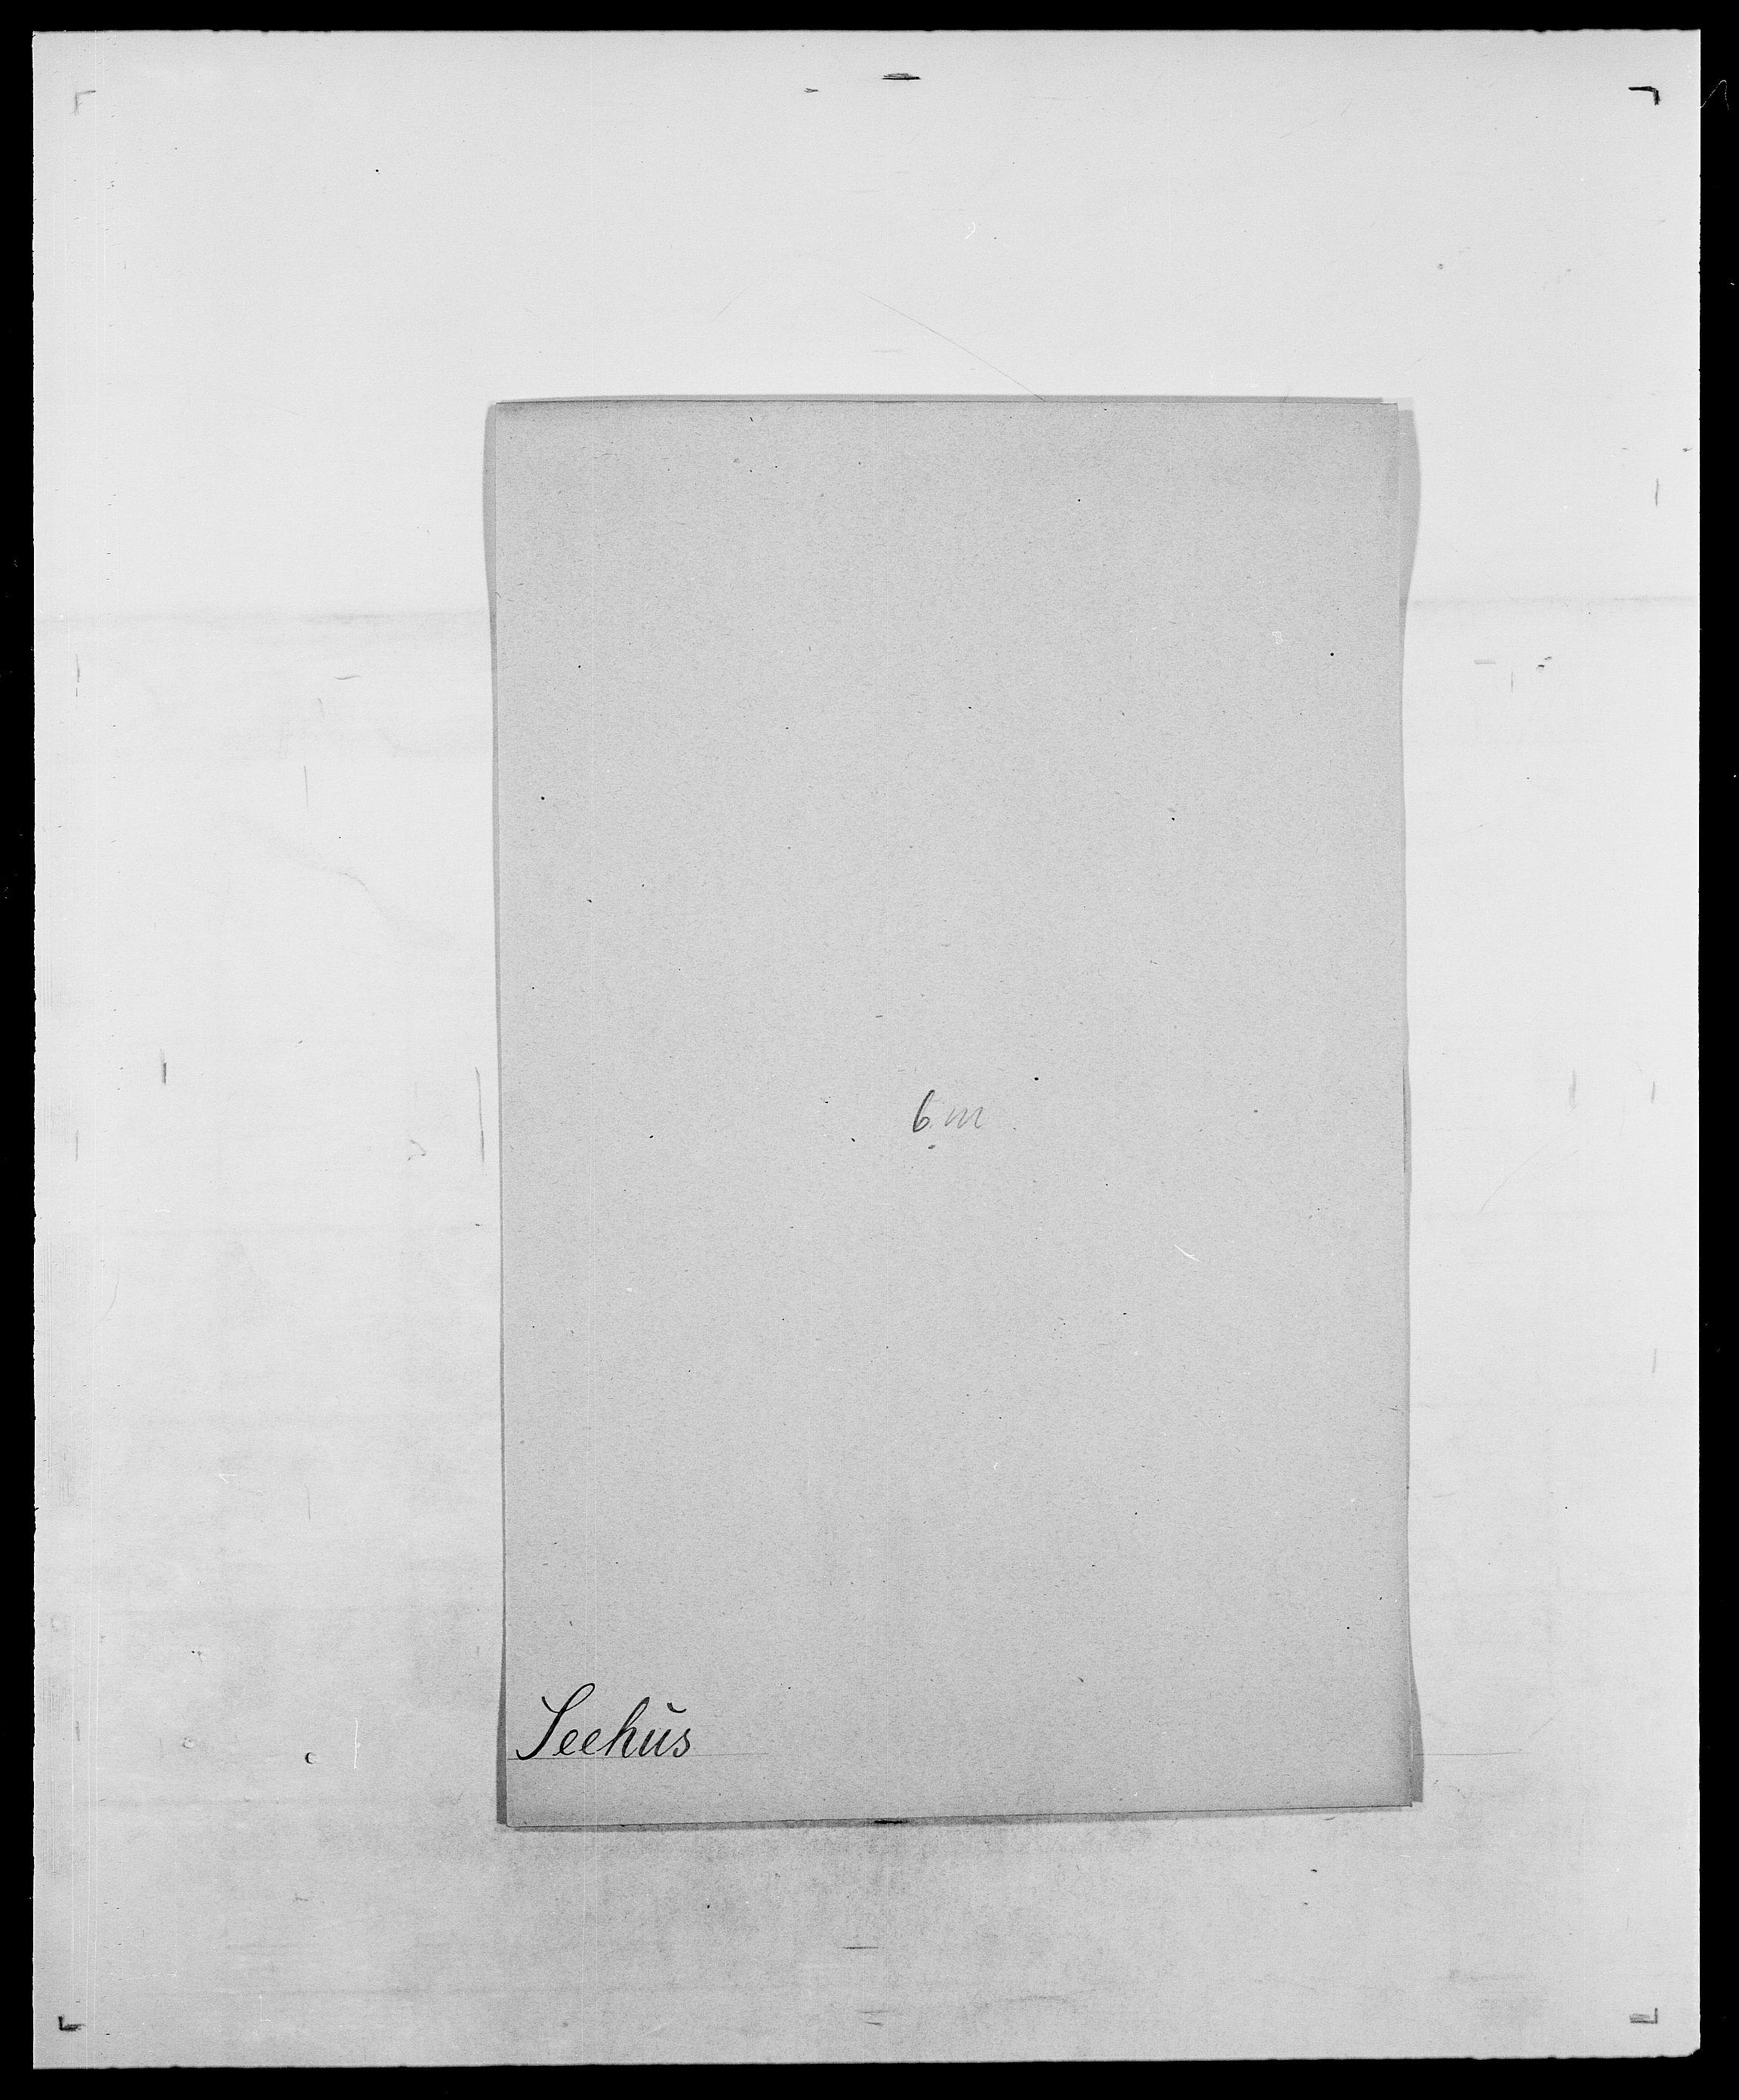 SAO, Delgobe, Charles Antoine - samling, D/Da/L0035: Schnabel - sjetman, s. 539